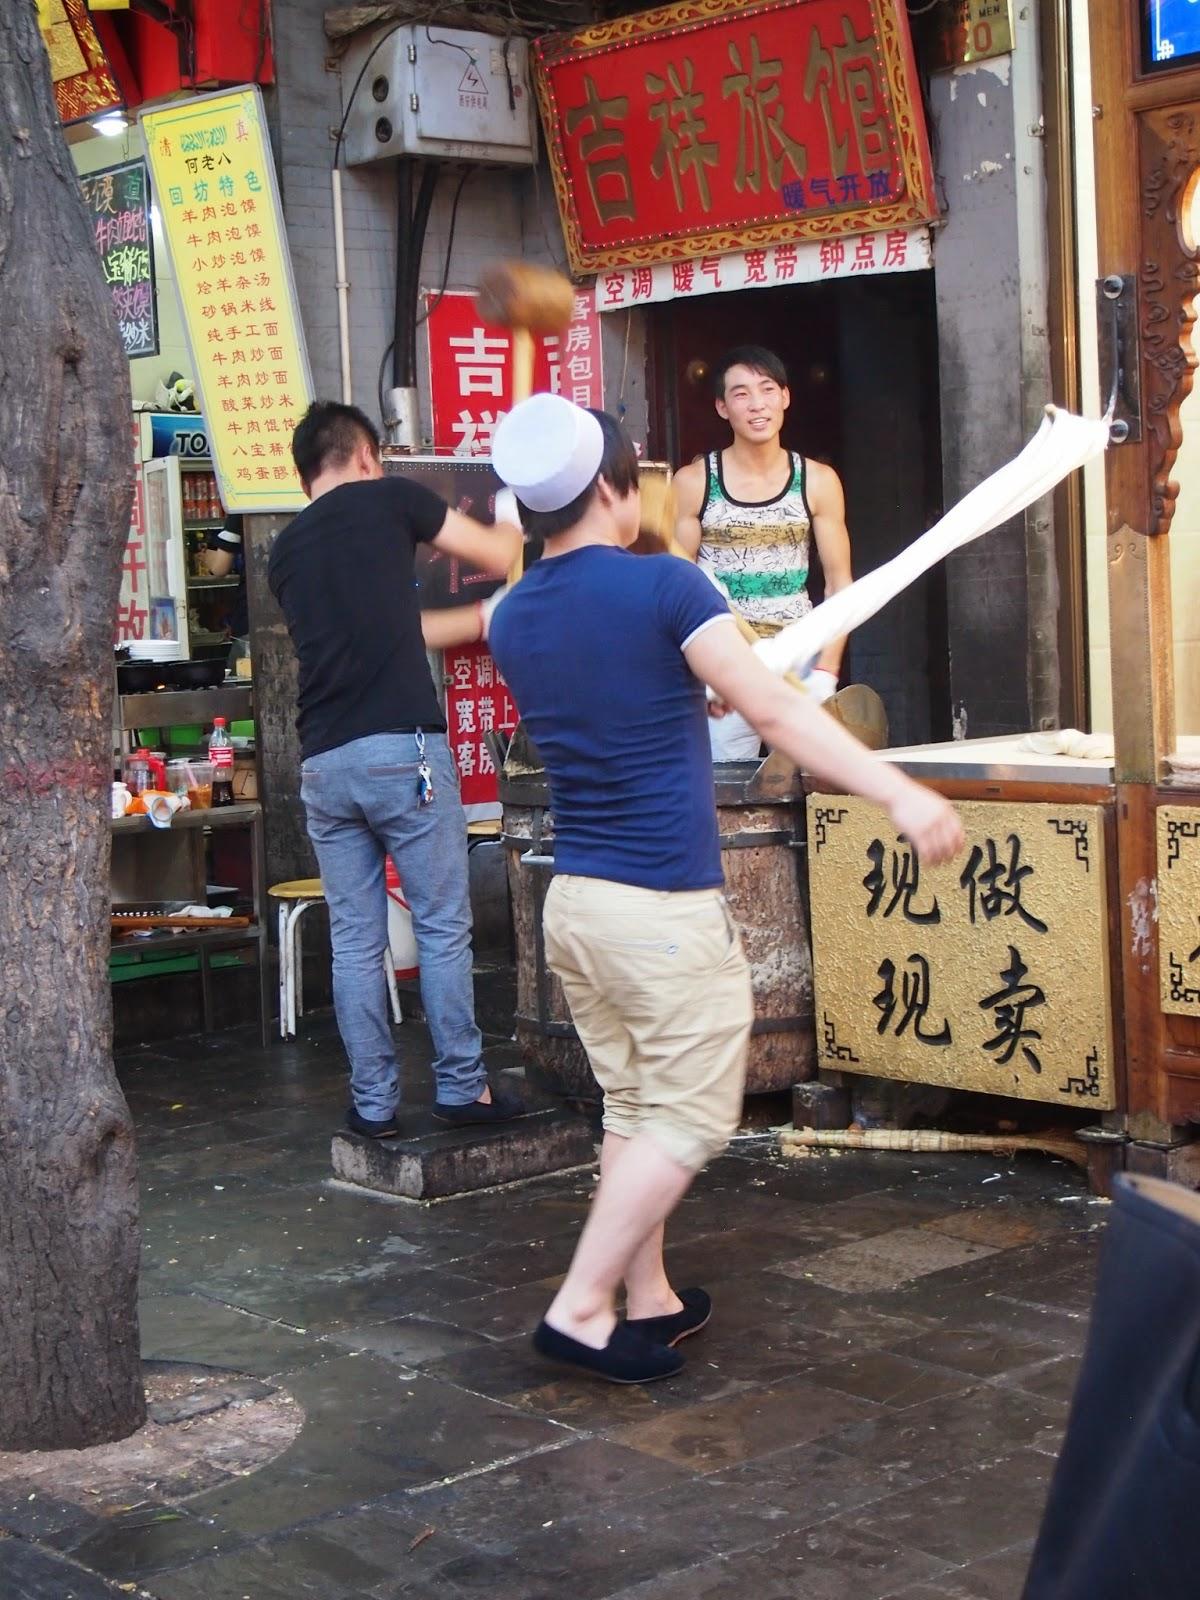 pulling peanut brittle in Xi'an